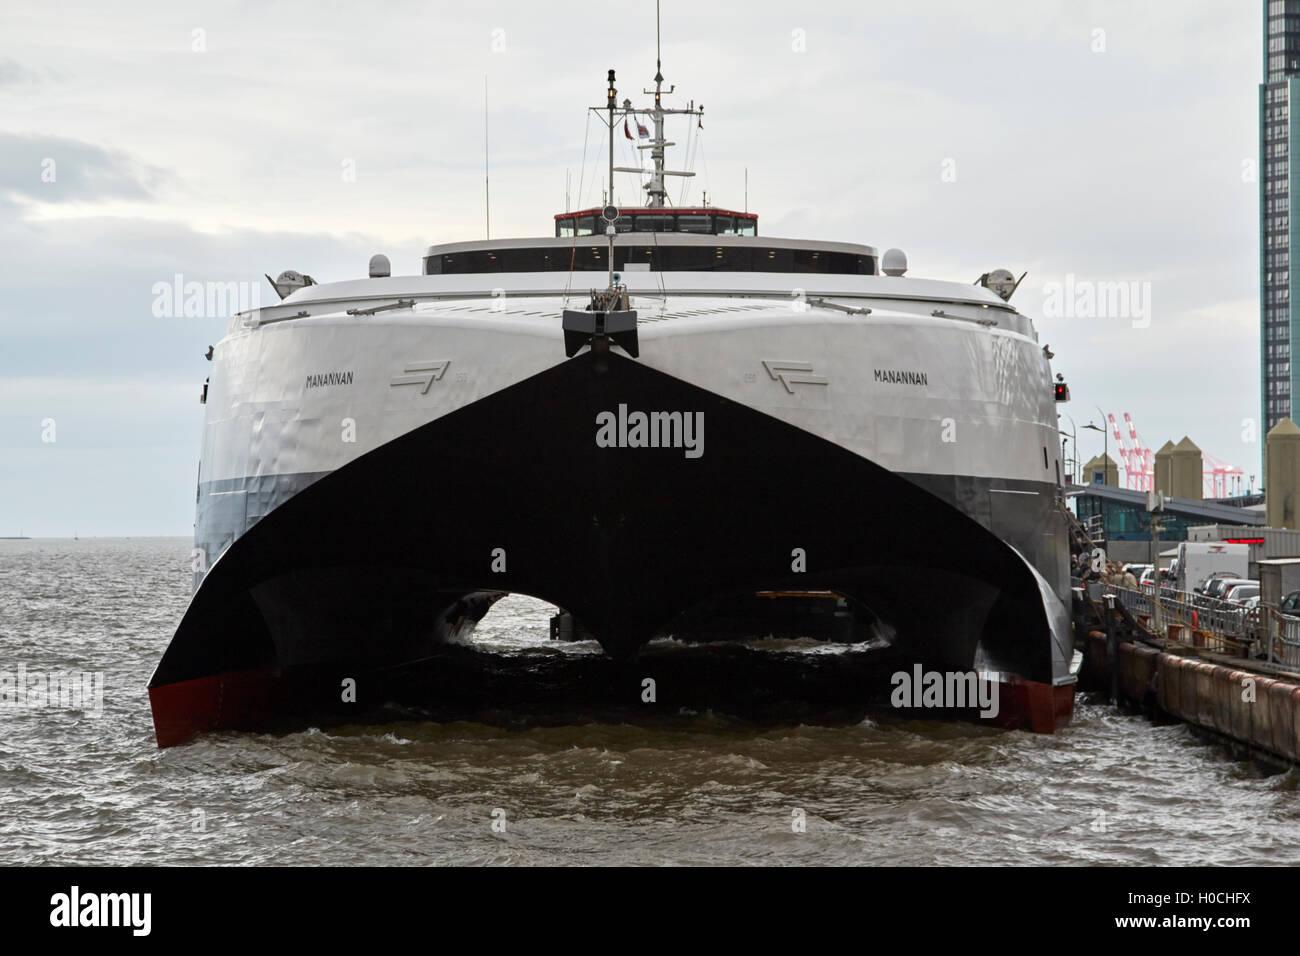 HSC manannan catamaran car ferry isle of man steam packet company Liverpool Merseyside UK Stock Photo